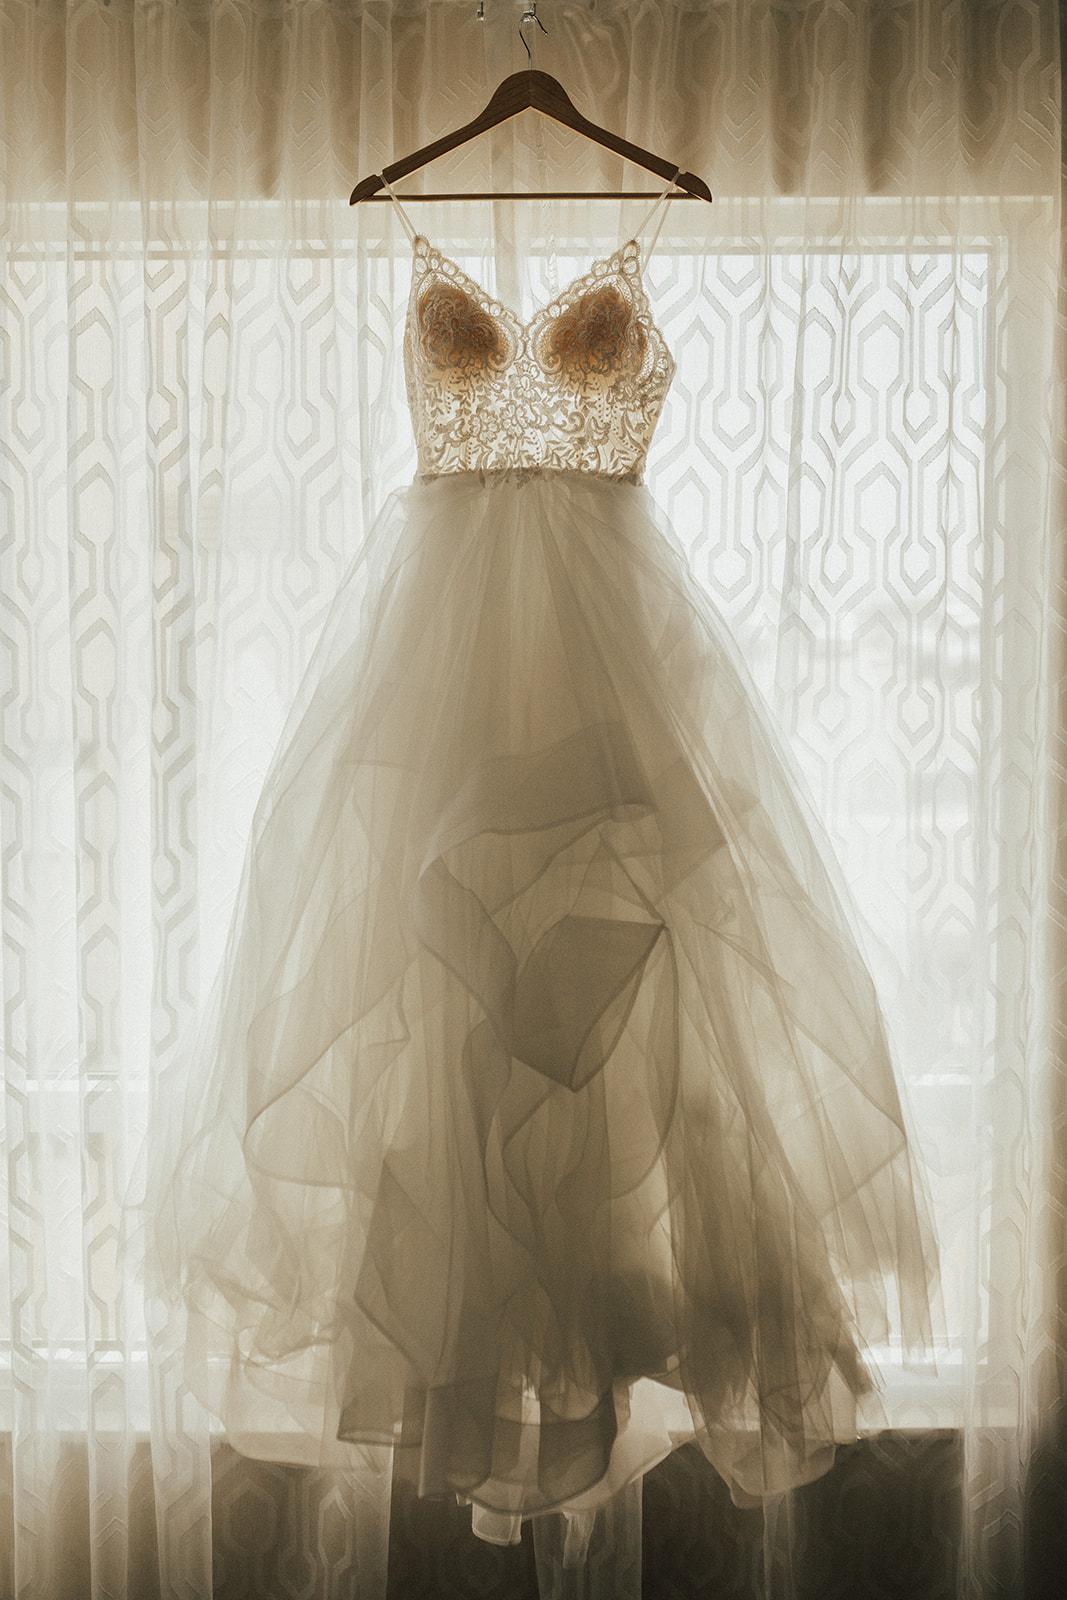 bridal gown spokane bride wedding dress